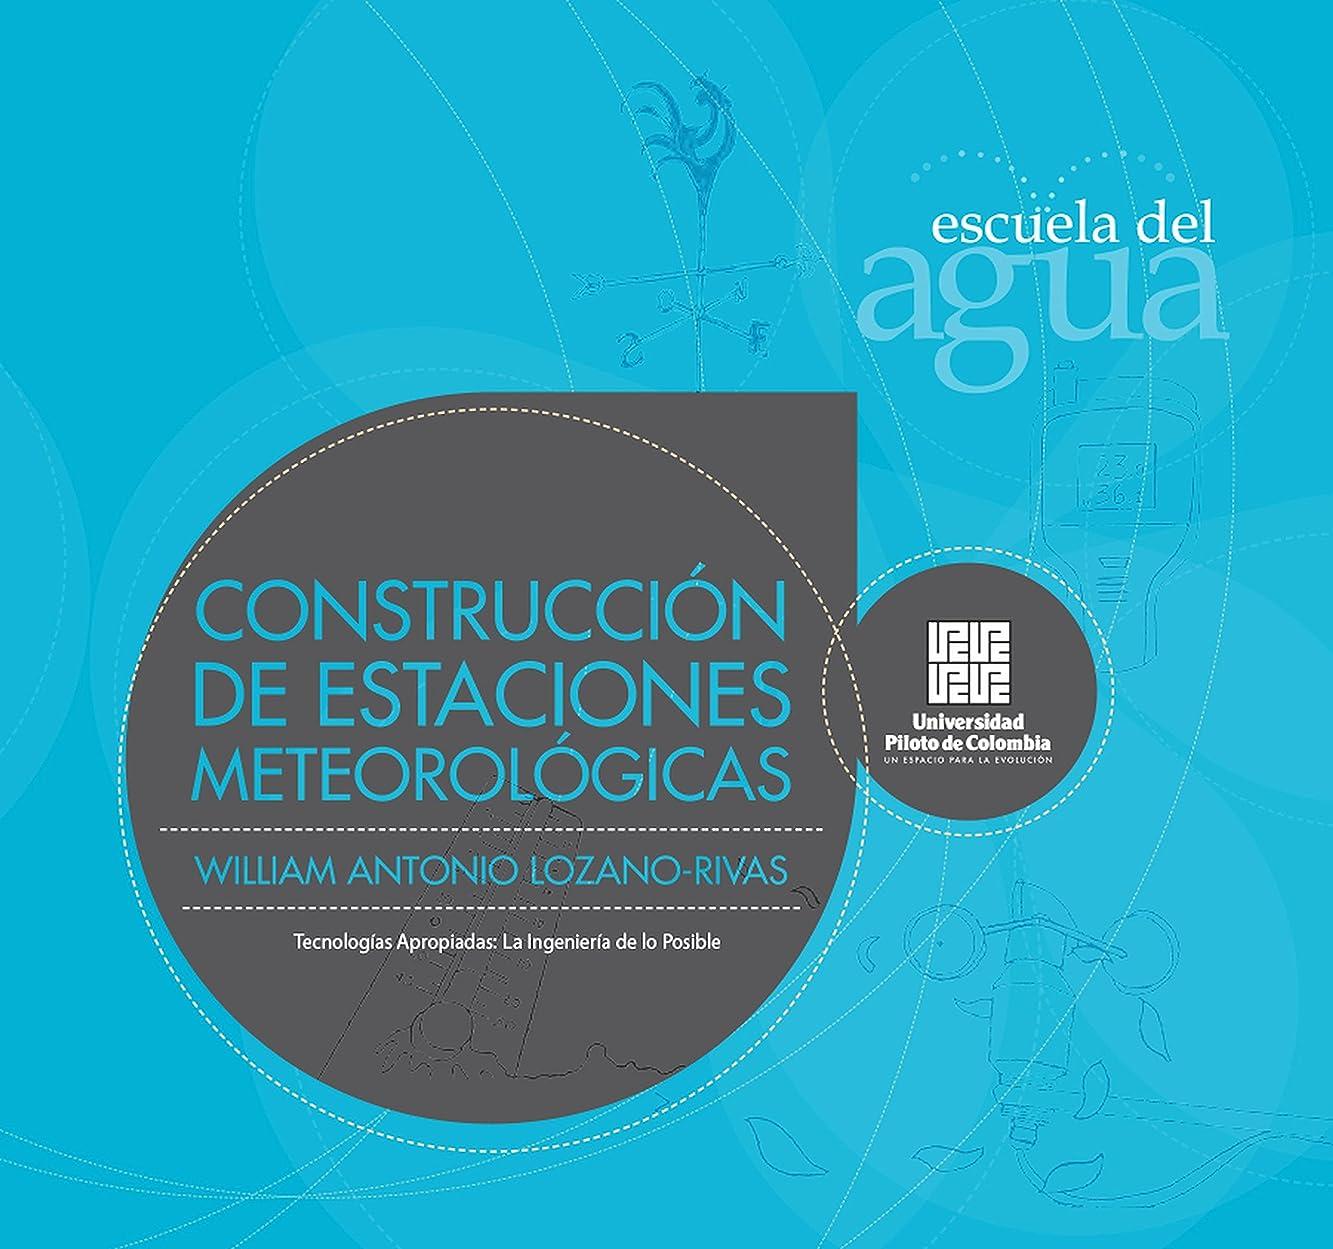 打ち負かすファイアル許すConstrucción de estaciones metereológicas (Tecnologías Apropiadas: La Ingeniería de lo Posible no 1) (Spanish Edition)